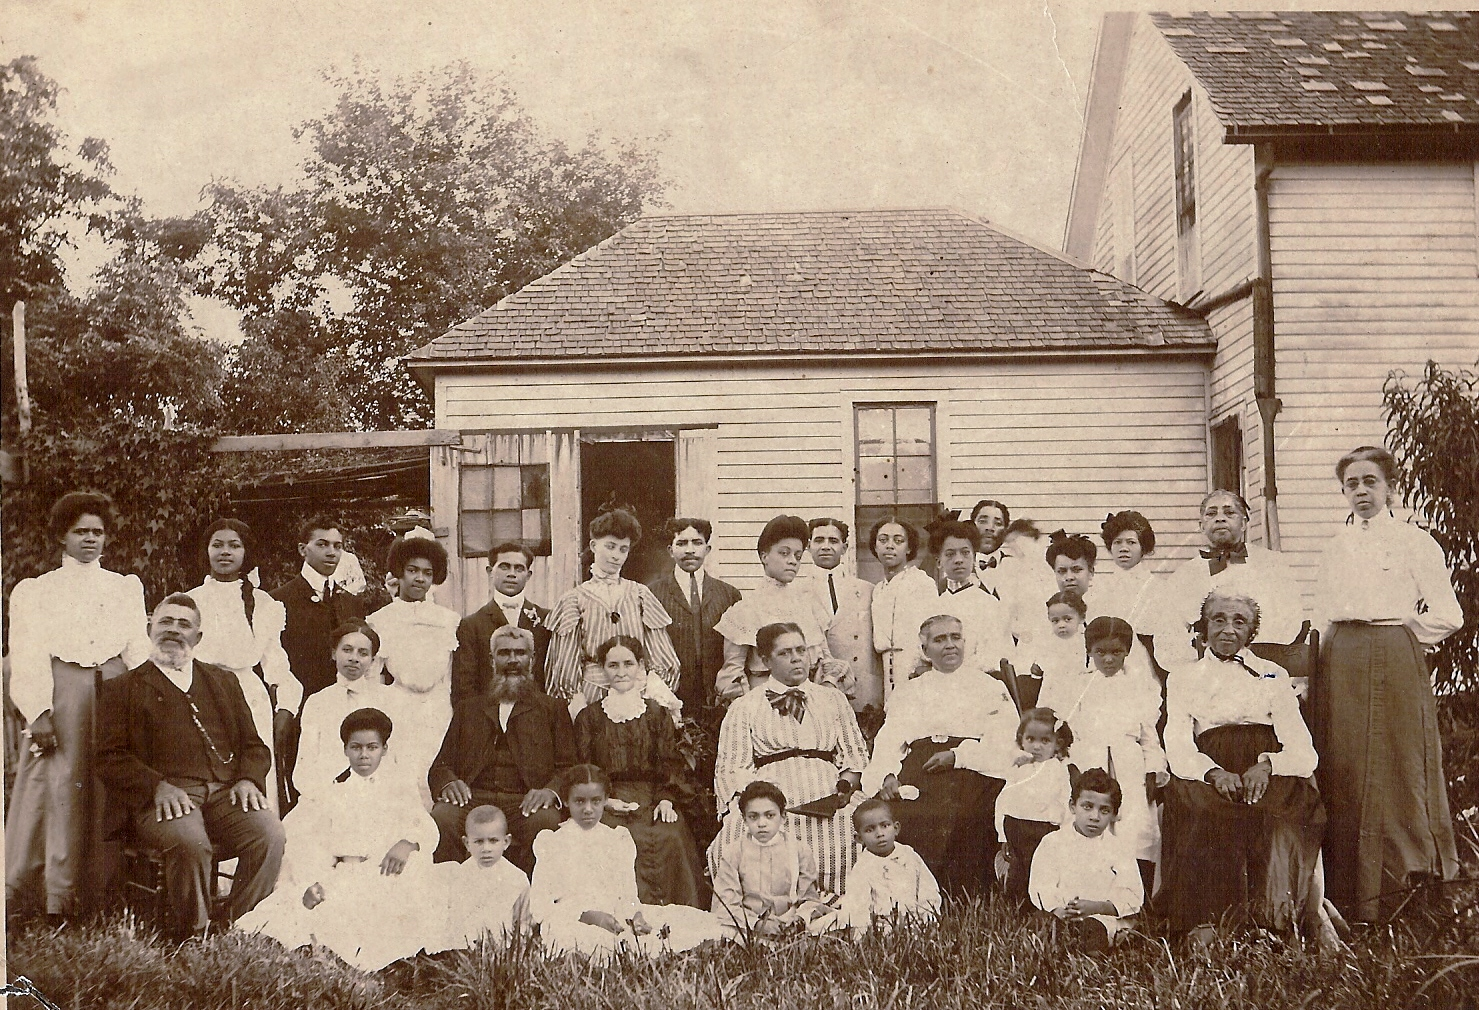 Johnson family reunion photo